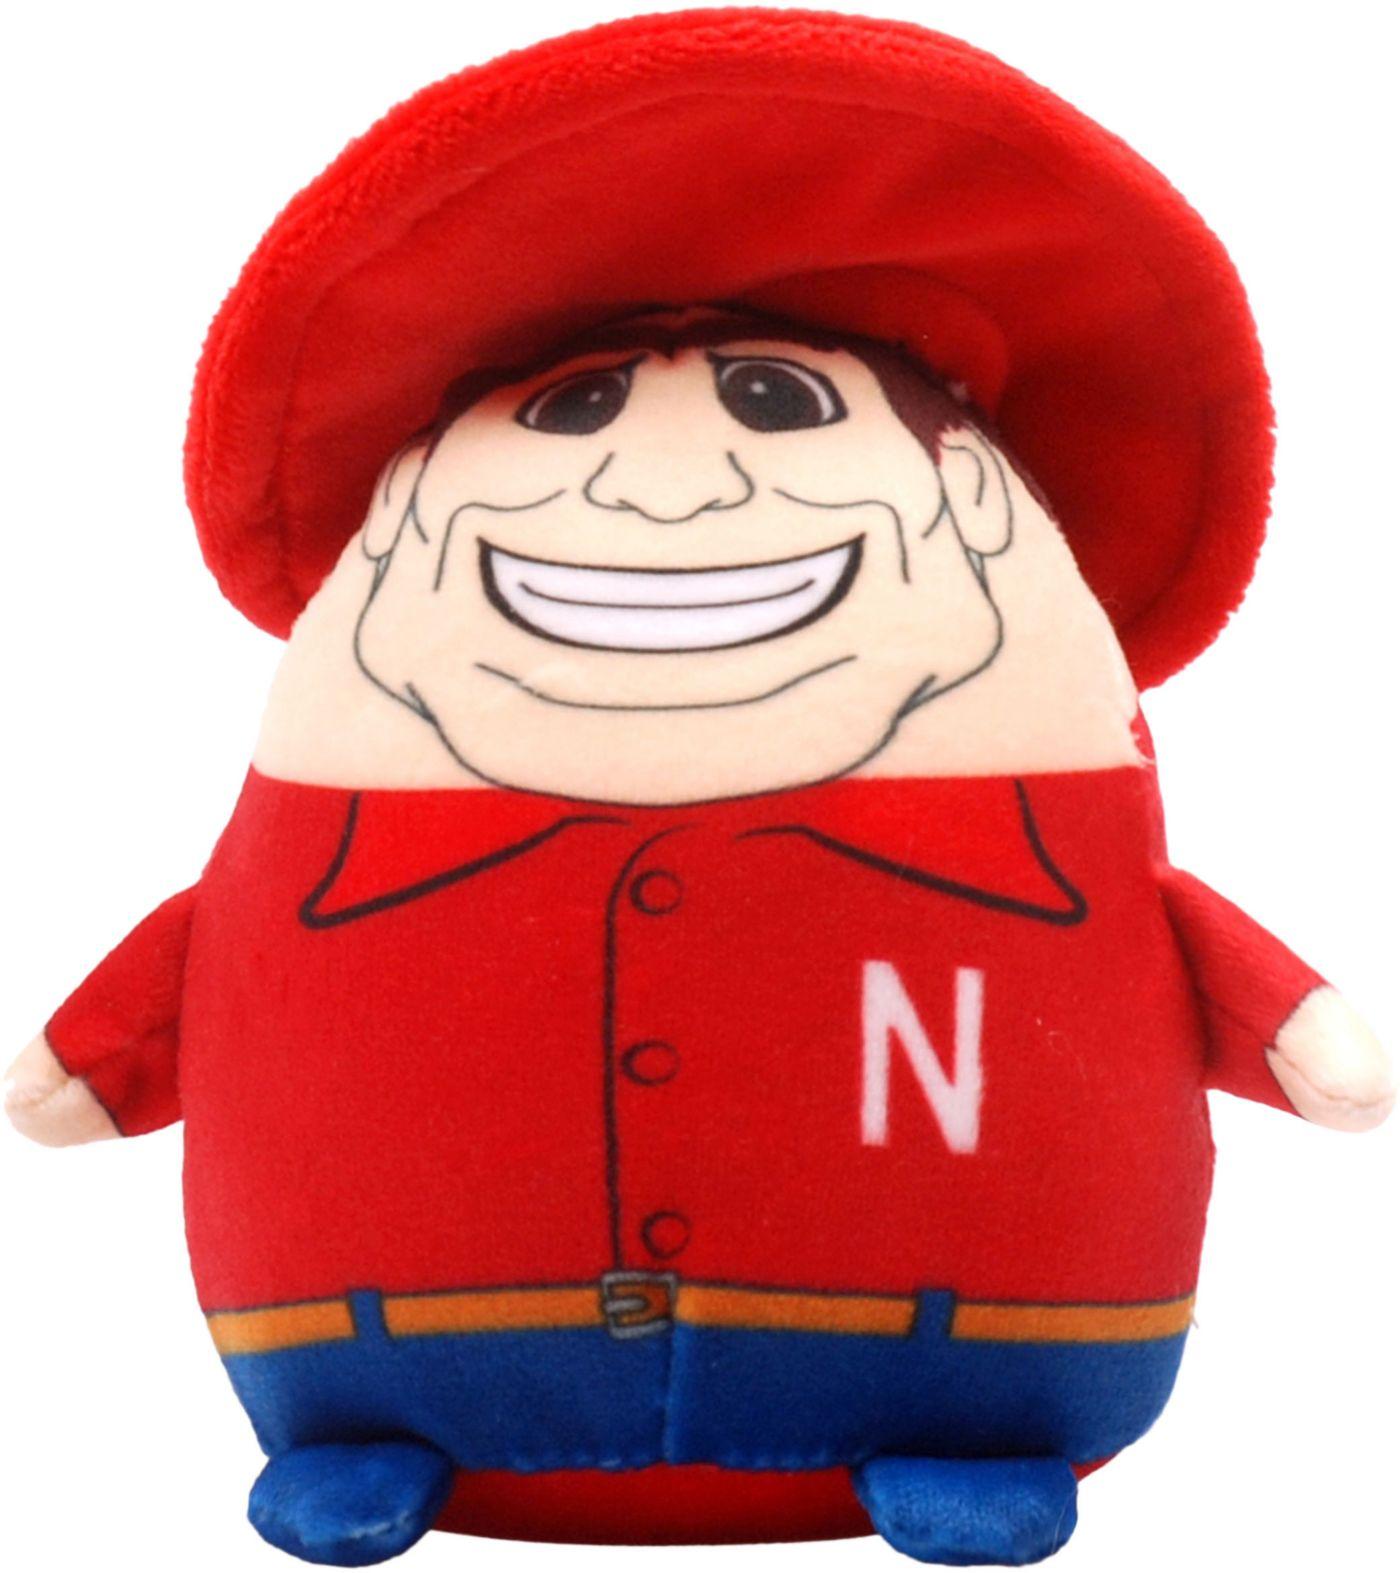 FOCO Nebraska Cornhuskers Mascot  Smusher Plush